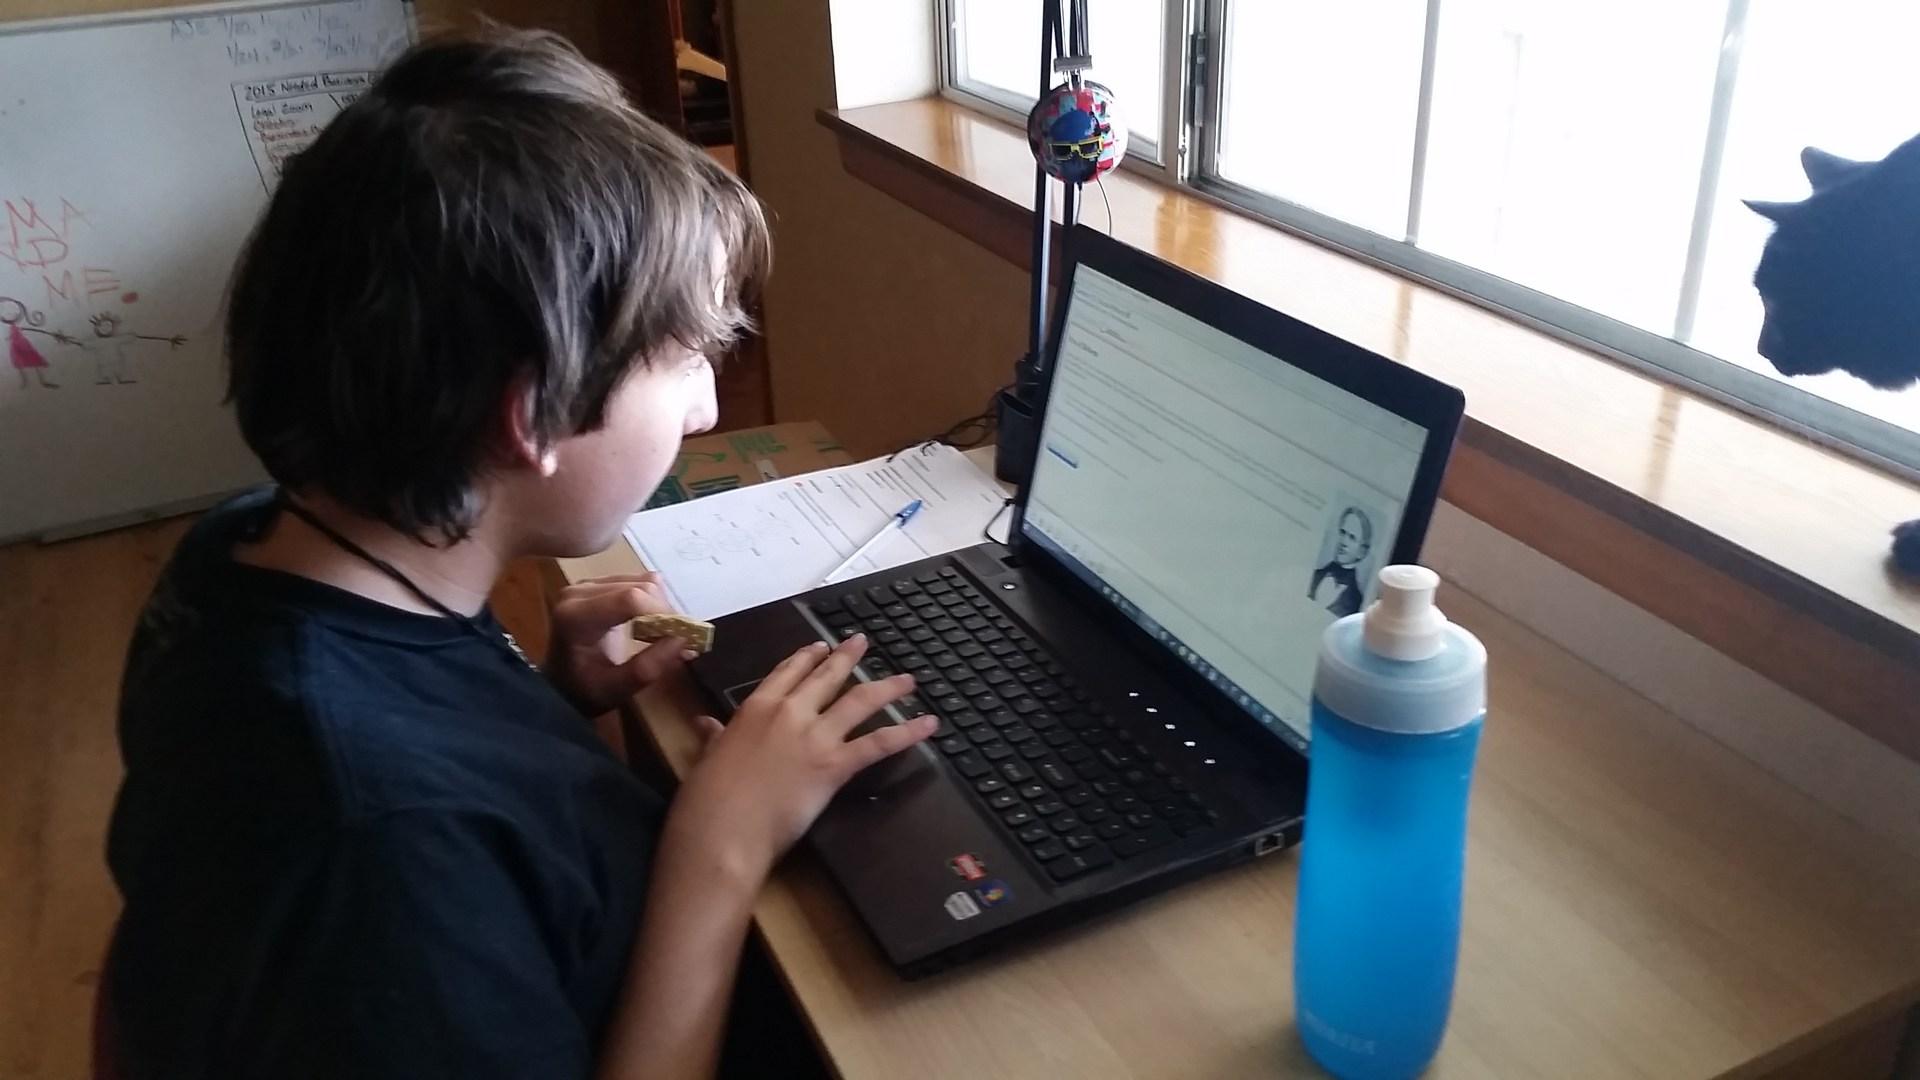 Student doing homework on computer